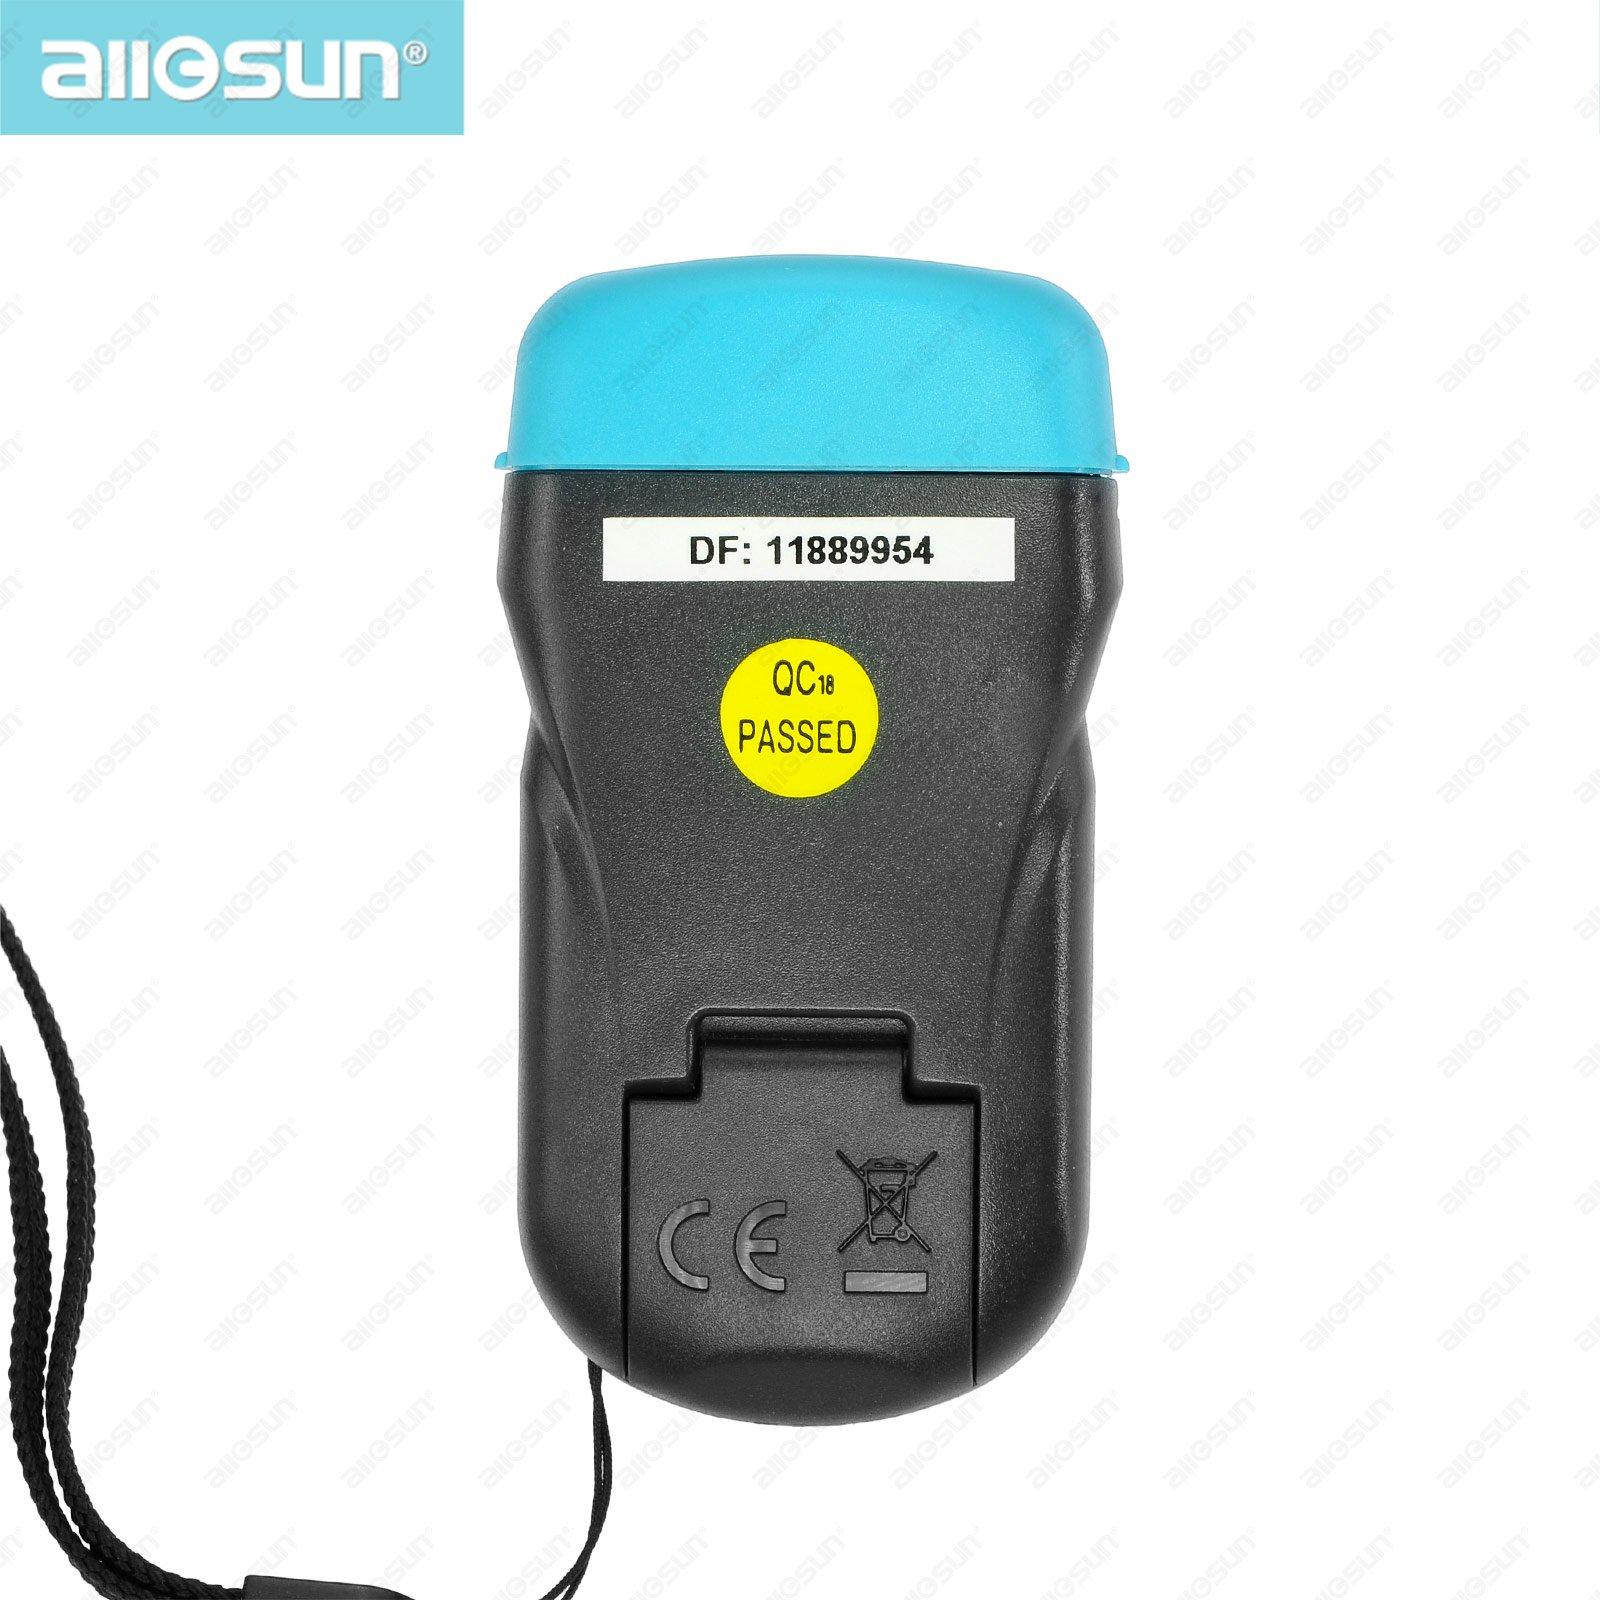 all-sun EM4813 Wood Building Material Moisture Meter Portable Environment temperature Tester Durable Moisture Meter<br><br>Aliexpress